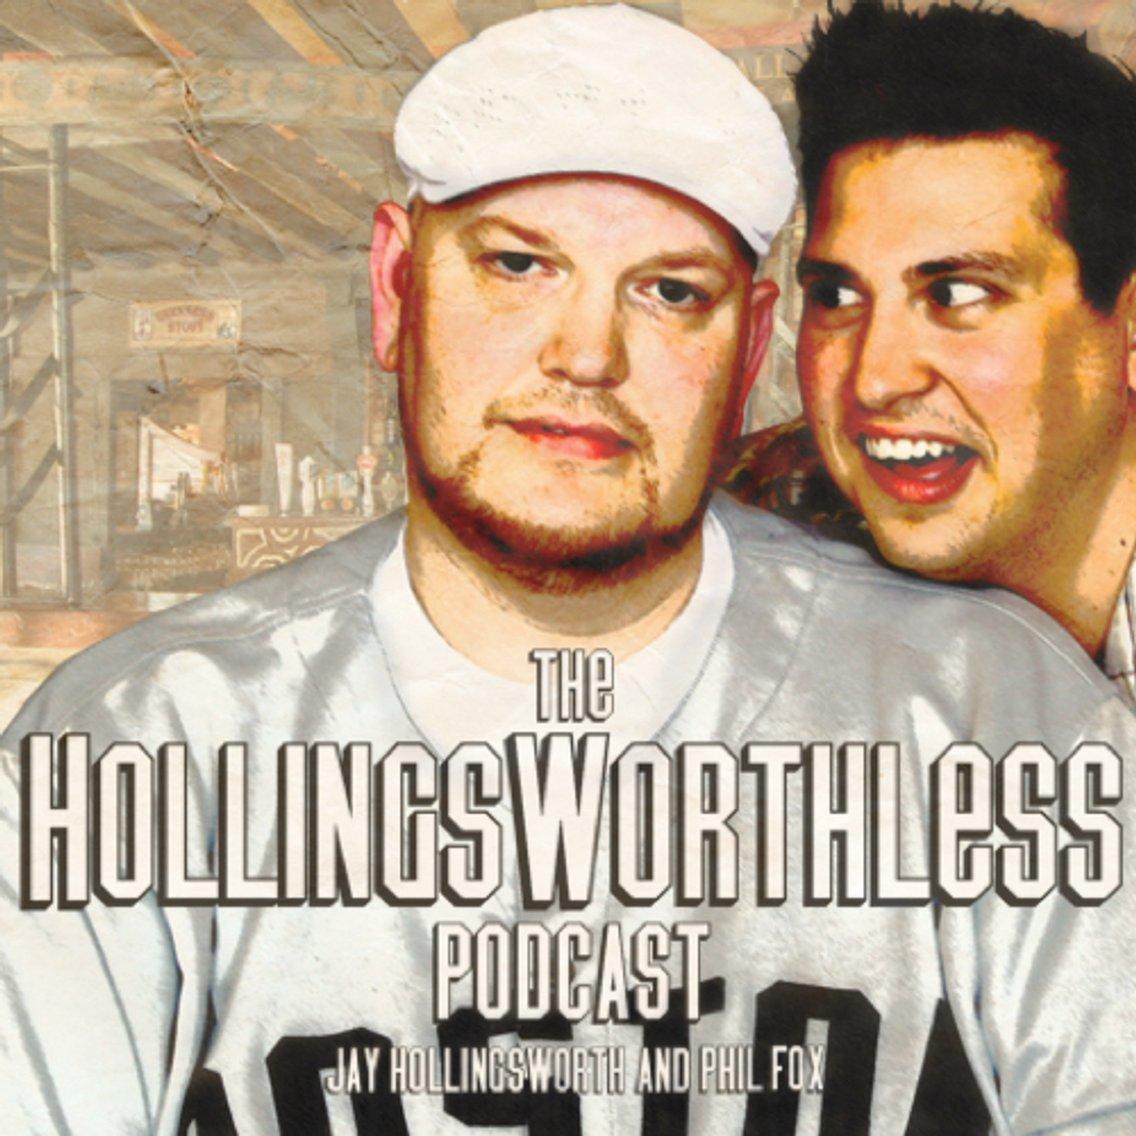 The HollingsWorthless Podcast - immagine di copertina